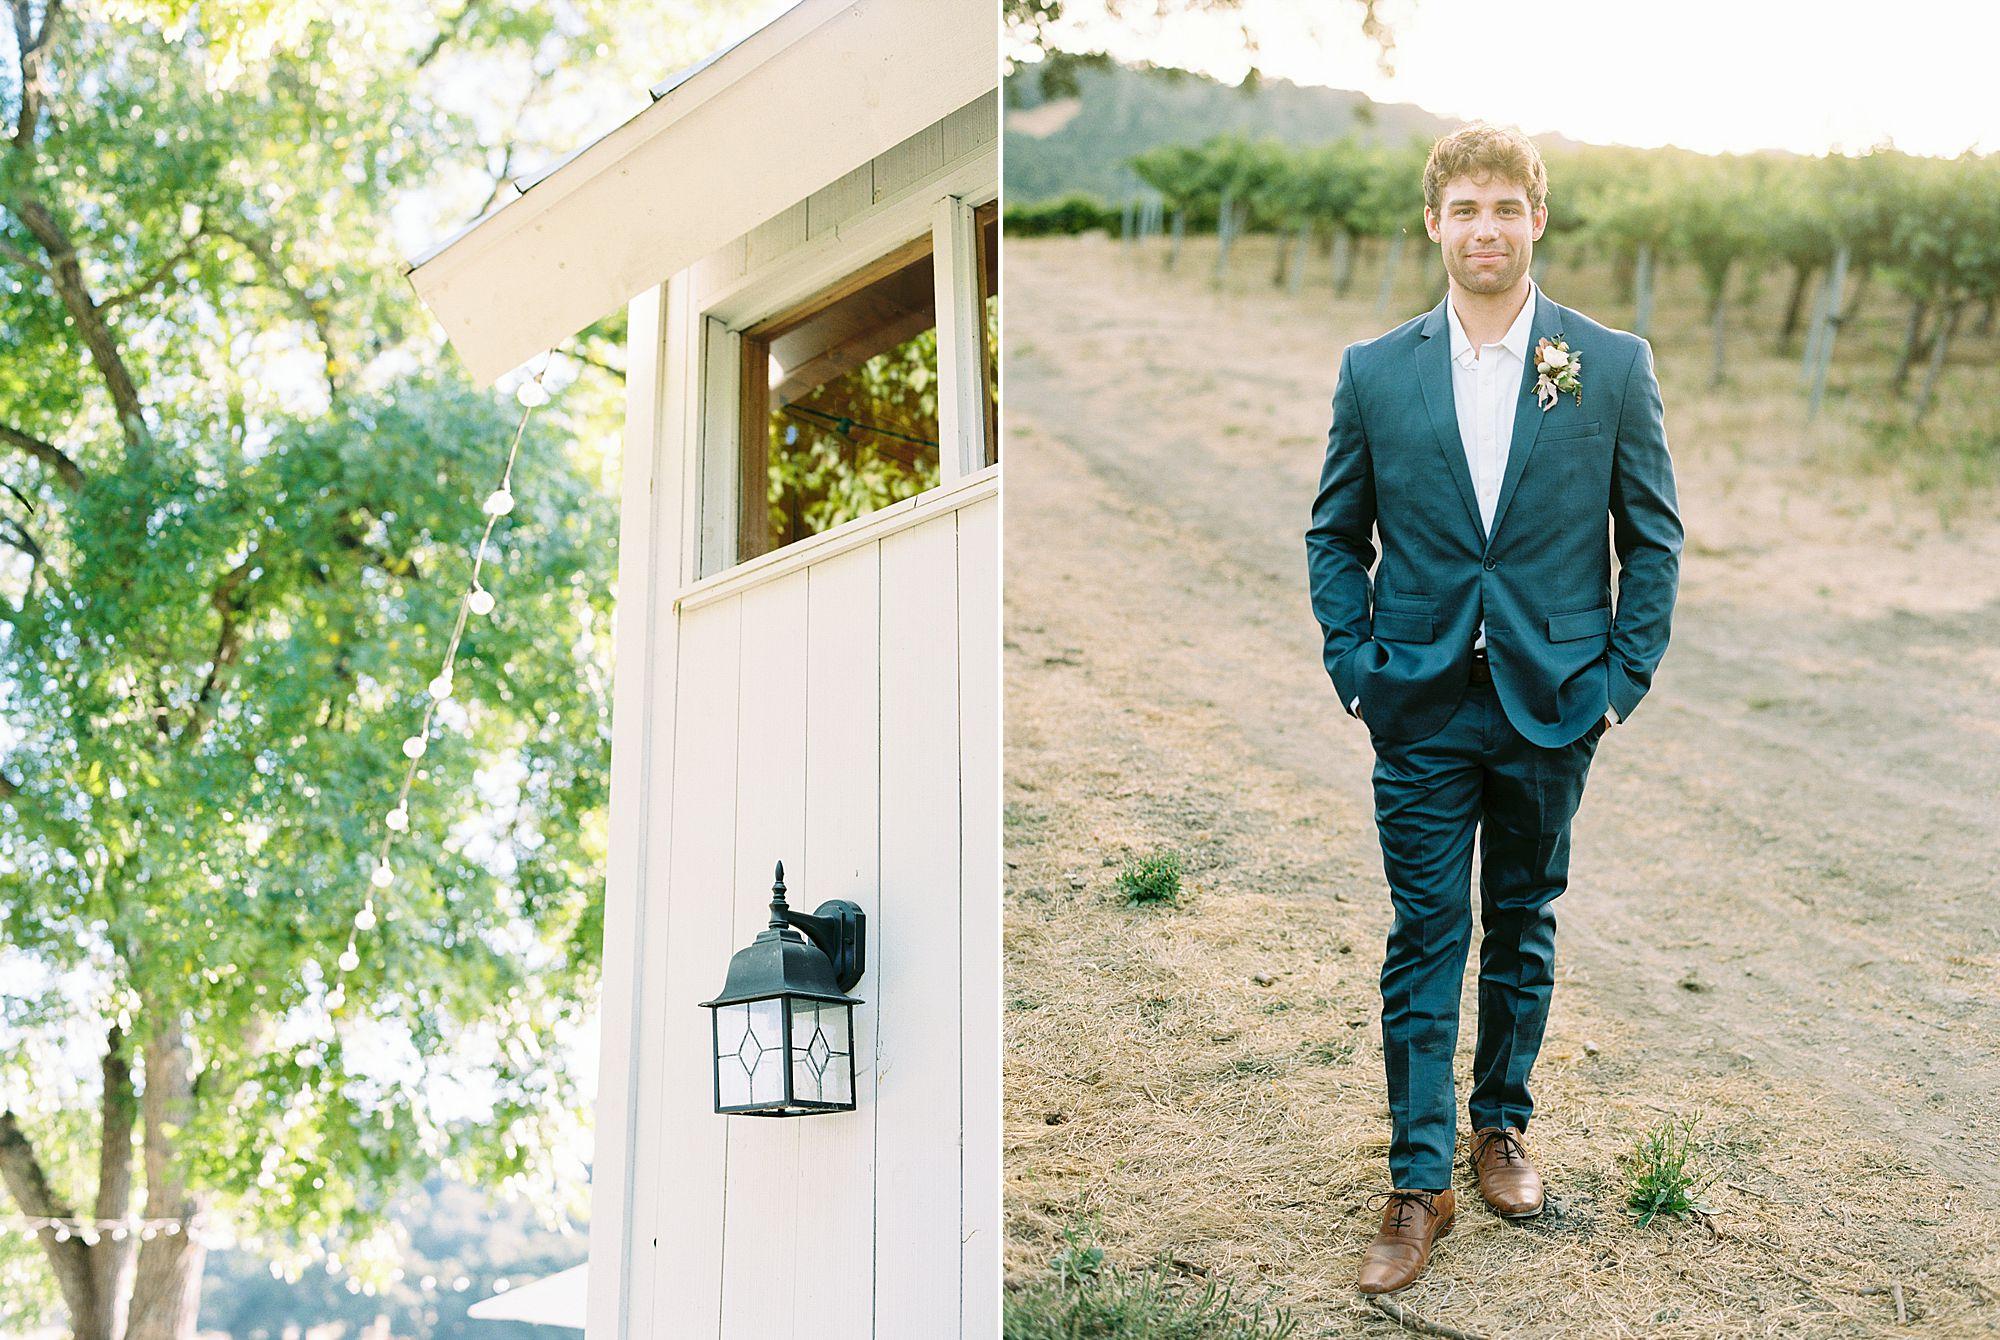 HammerSky Wedding Inspiration Featured on Hey Wedding Lady with Vanessa Noel Events - Ashley Baumgartner - SLO Wedding Photographer_0021.jpg